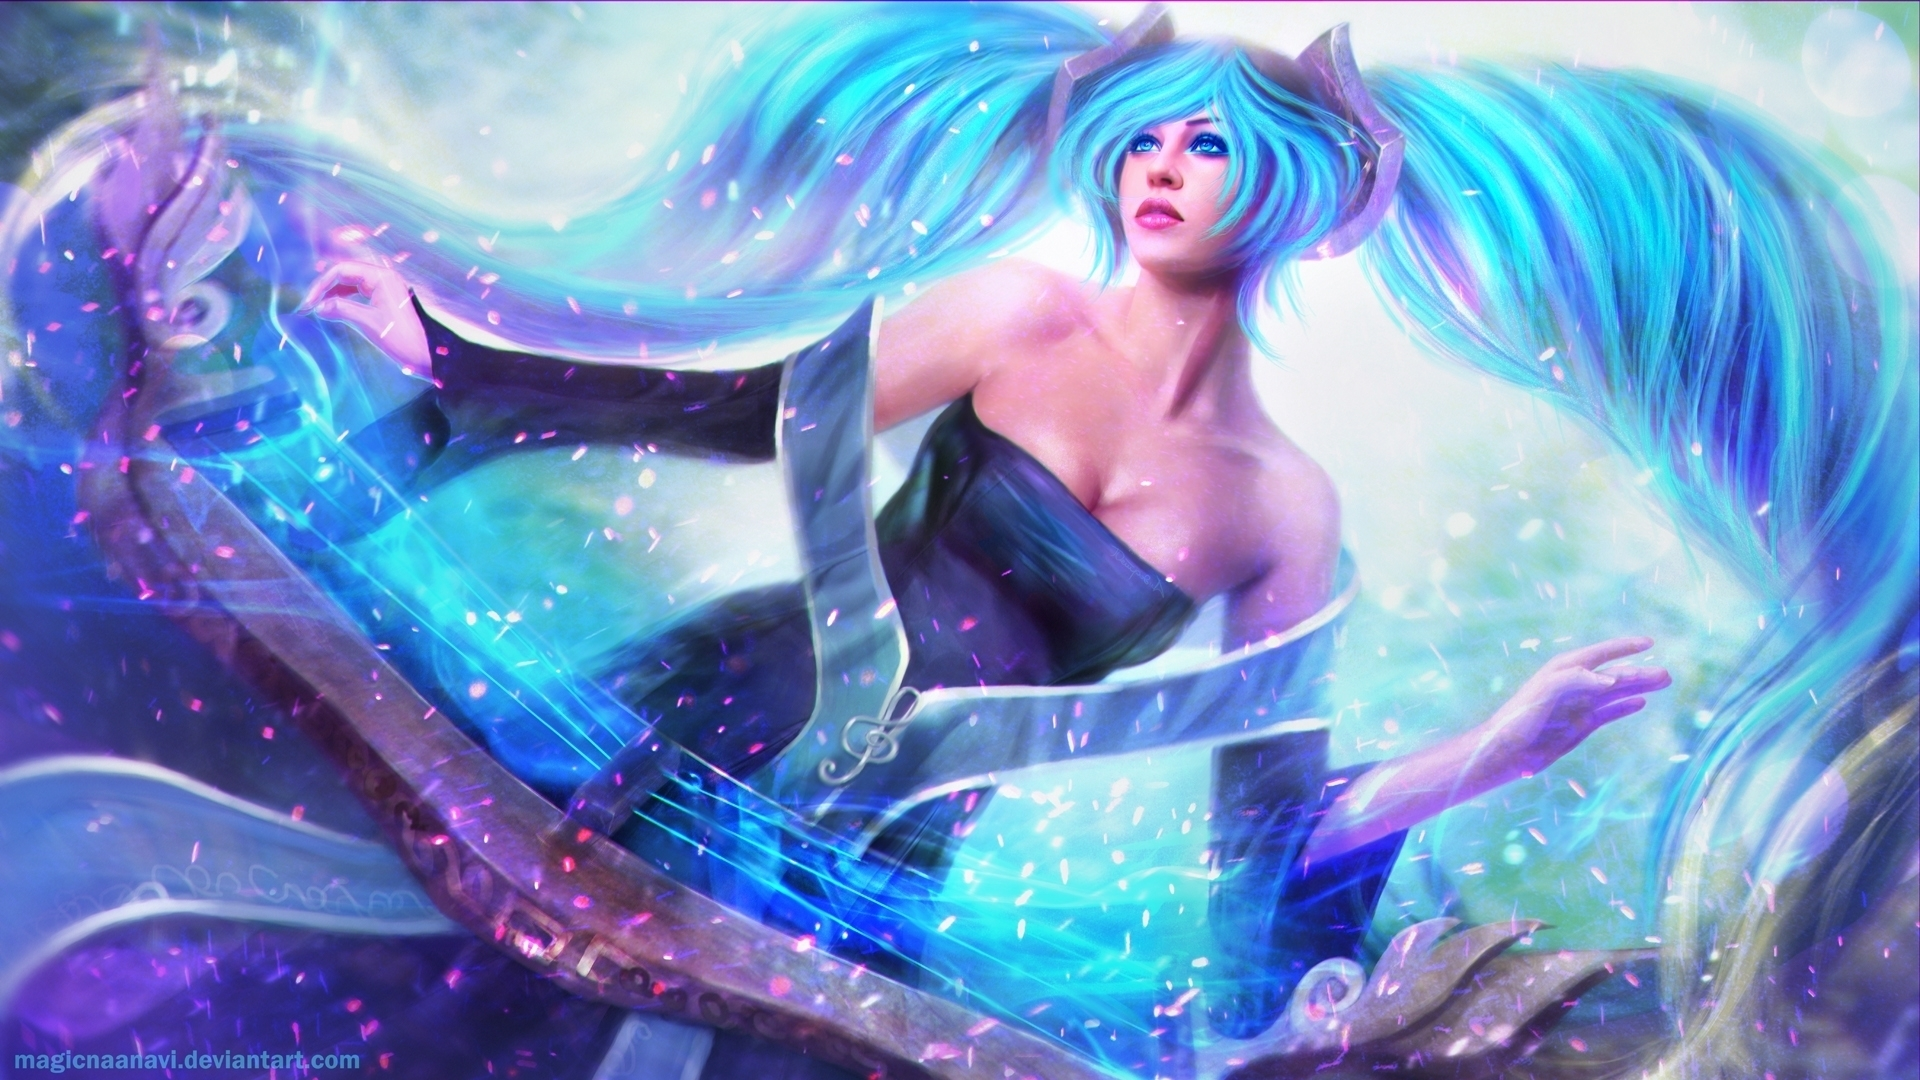 Sona League Of Legends Hd Wallpaper